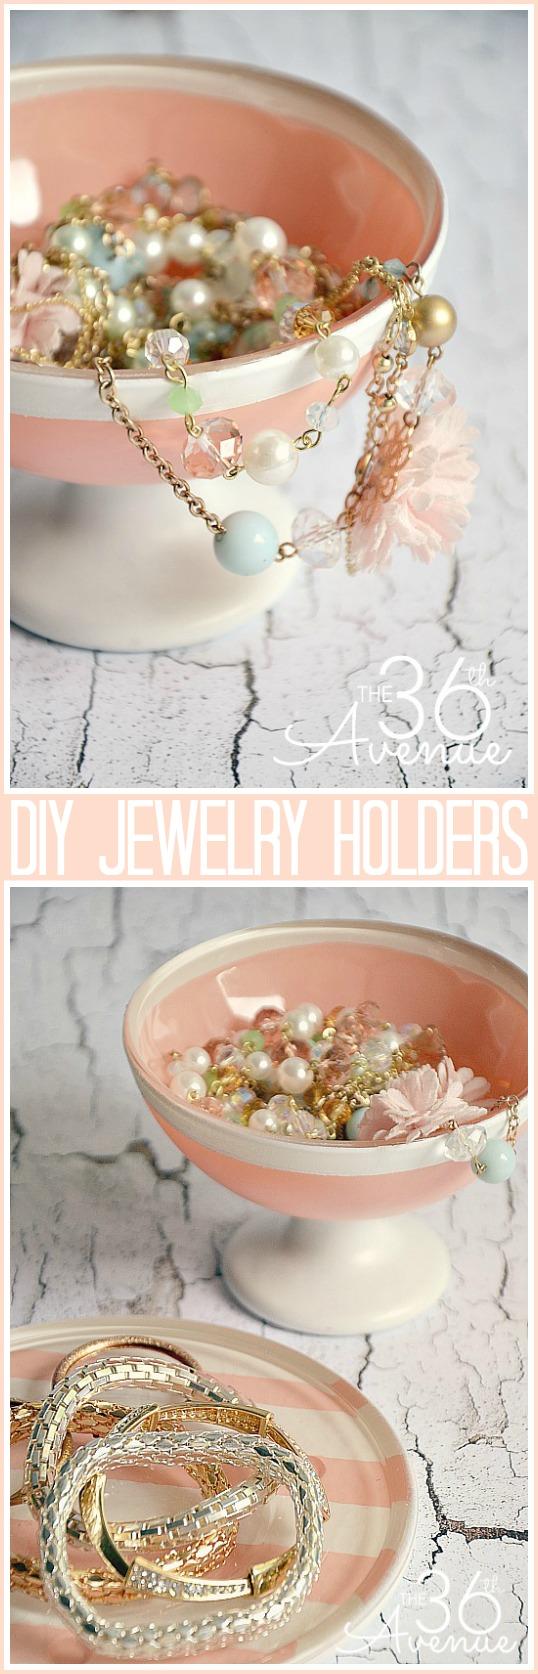 Jewelry Holder 21